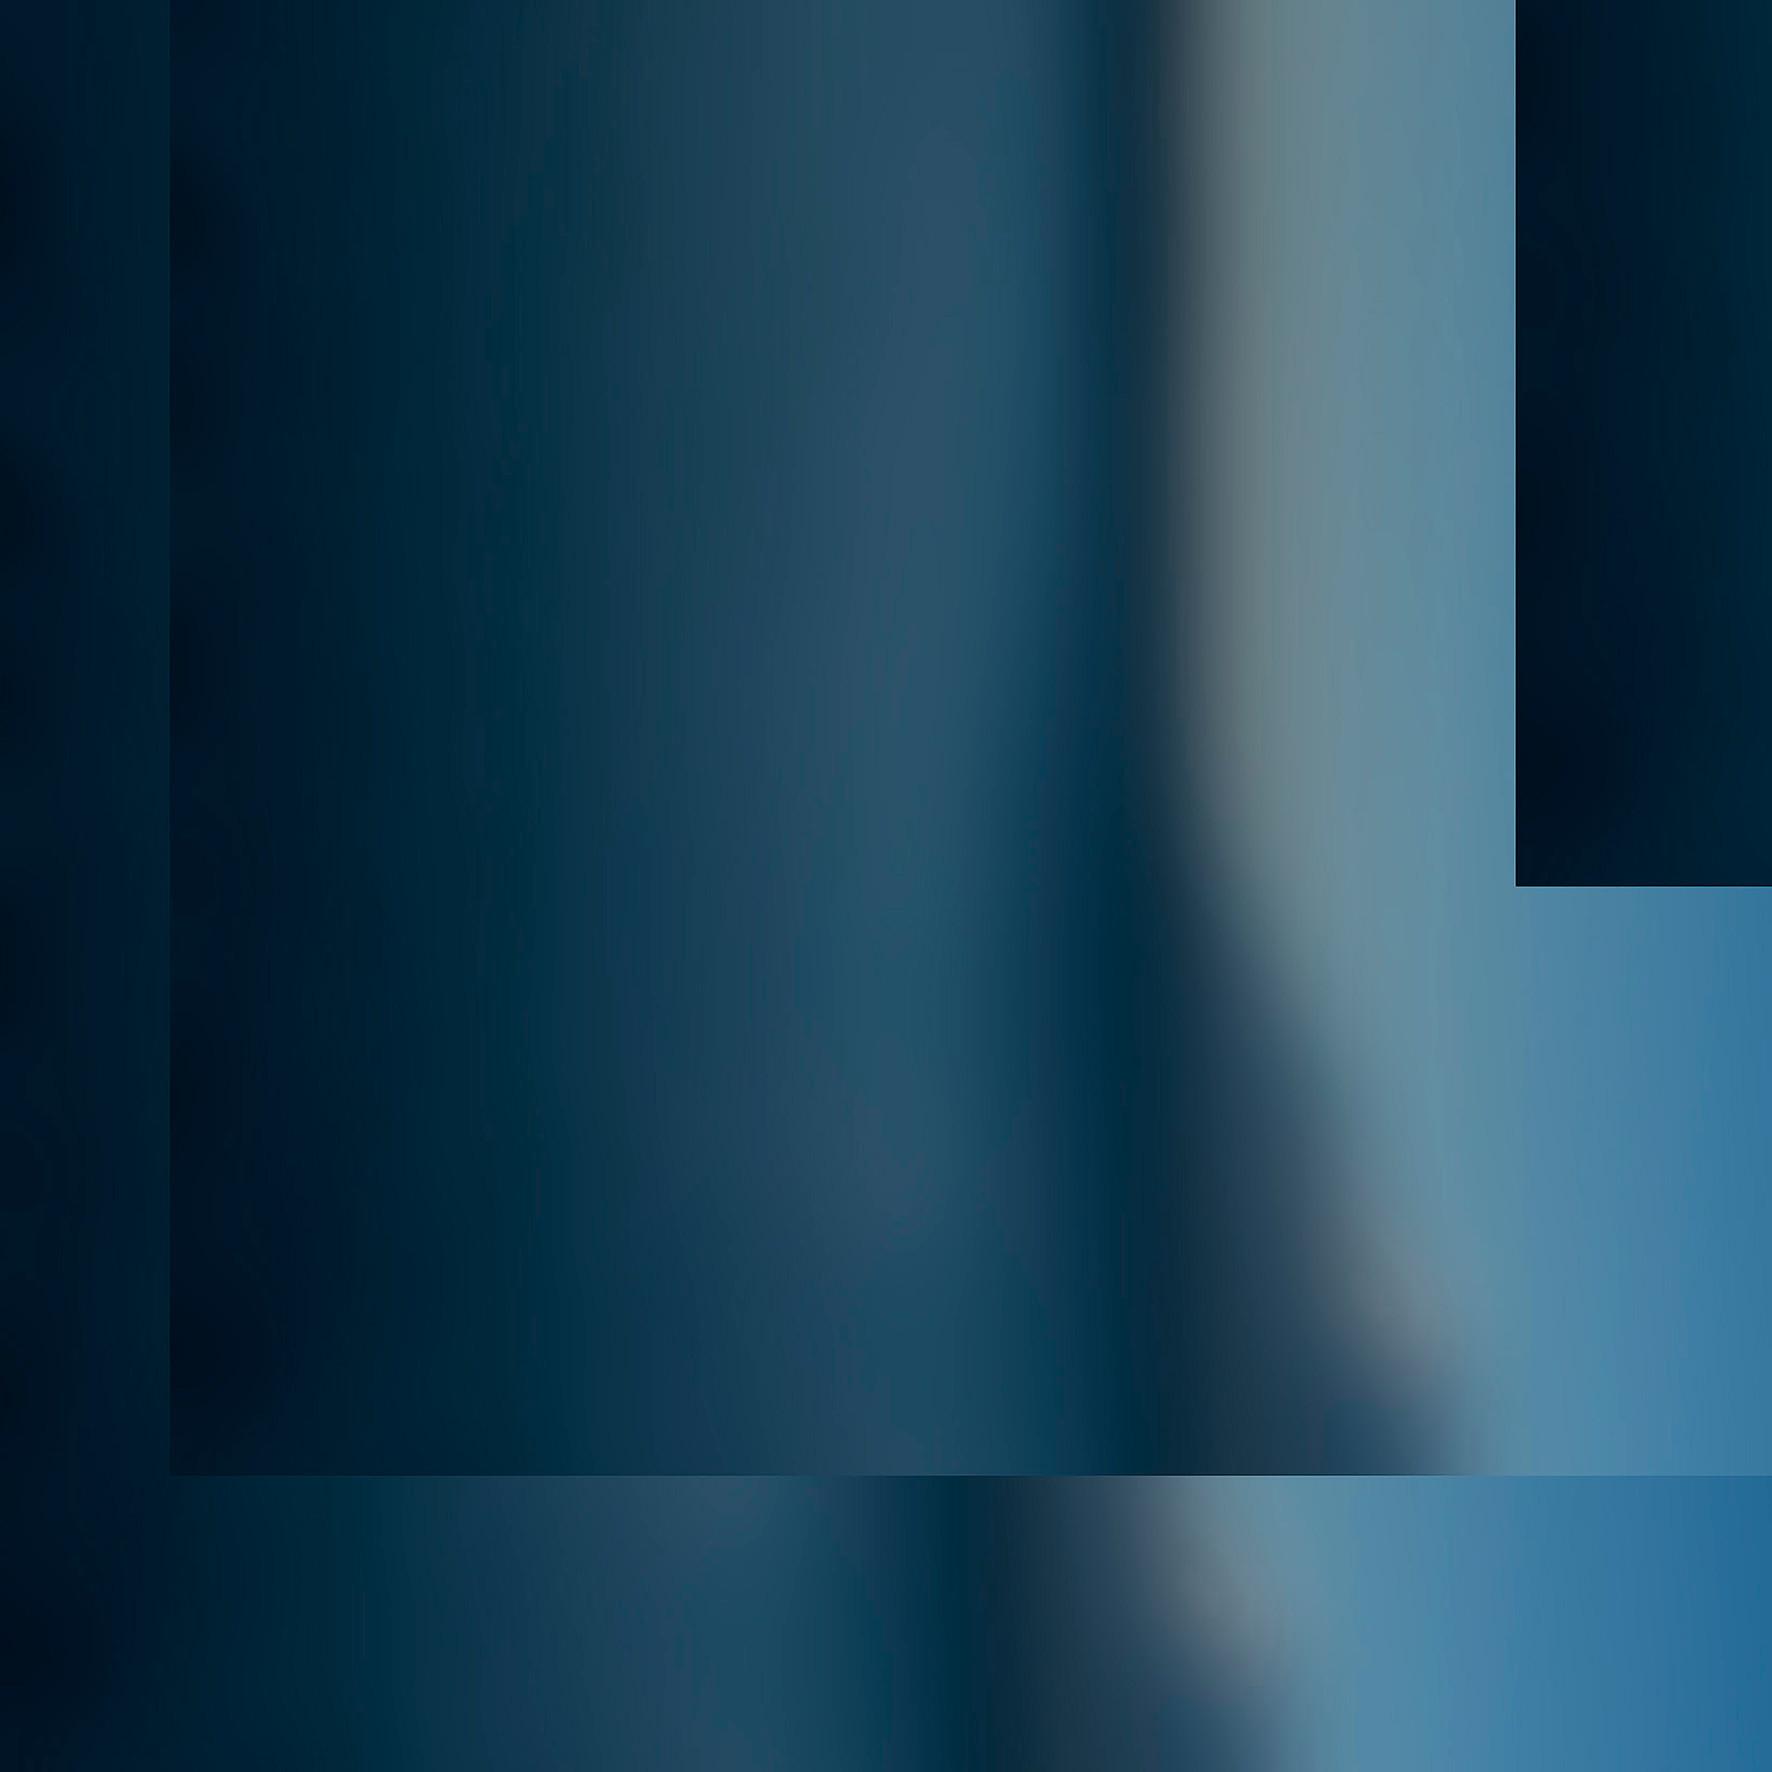 Blurry Doubt 2.jpg